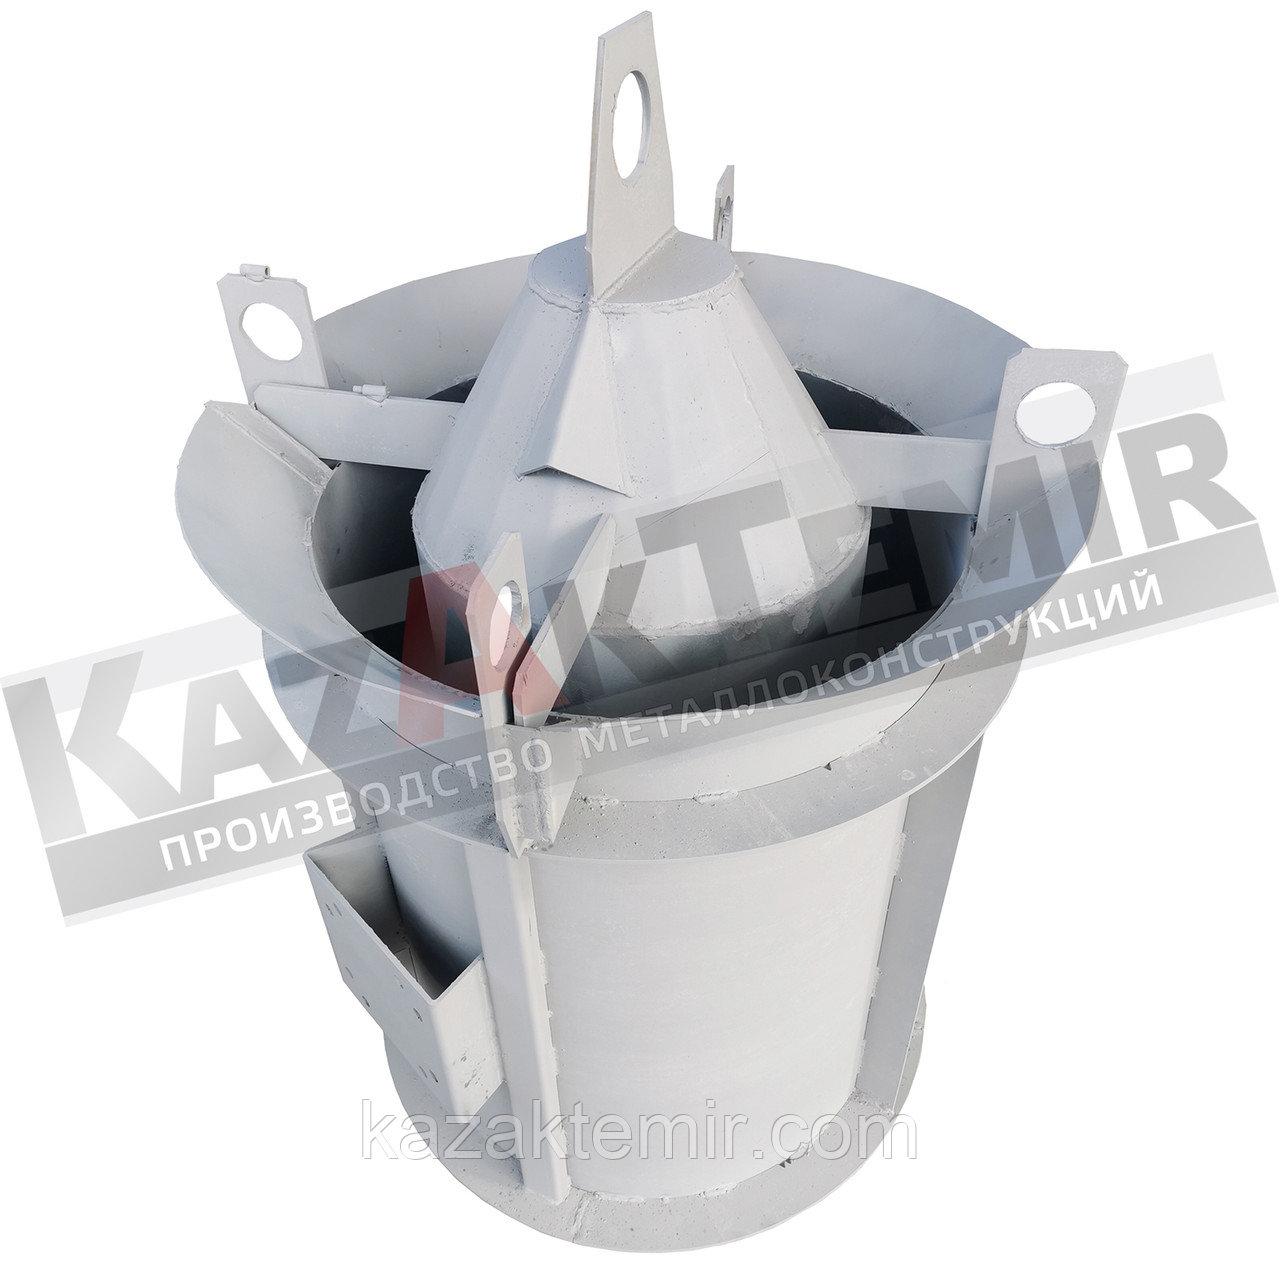 ЗКЦ 0.5 для производства дорожных железобетонных колец (металлоформа)